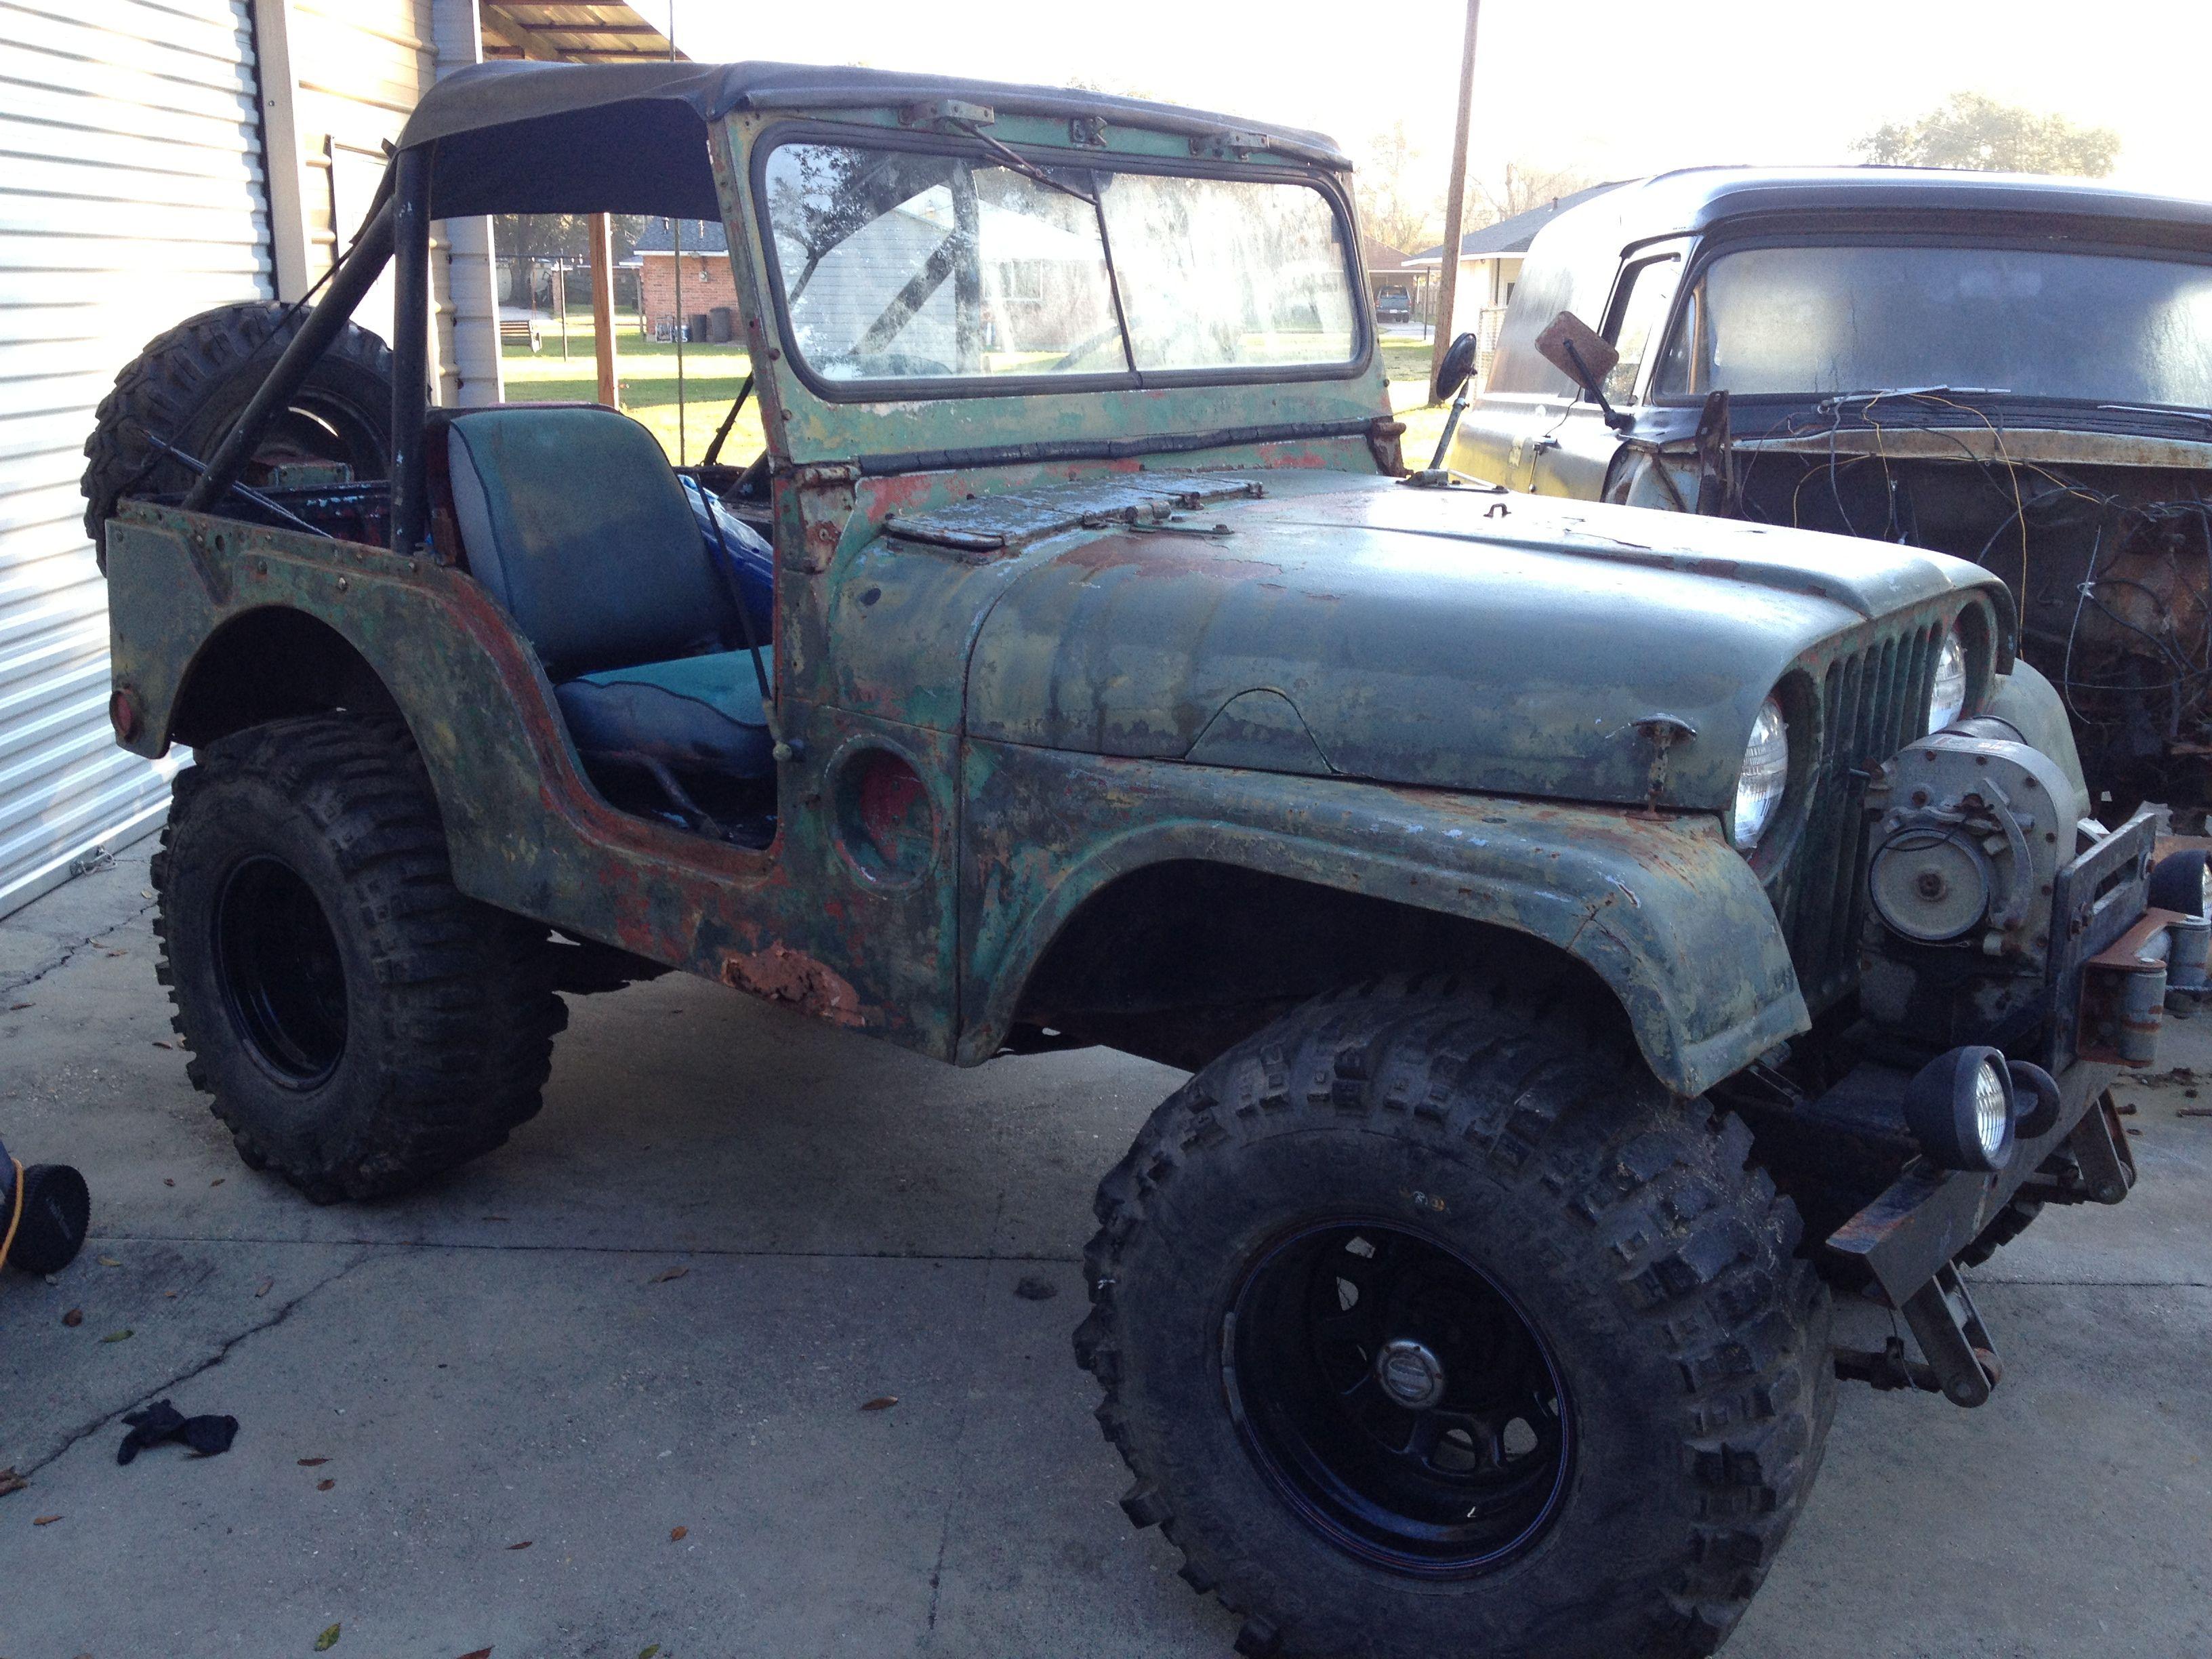 1952 m38a1 jeep [ 3264 x 2448 Pixel ]